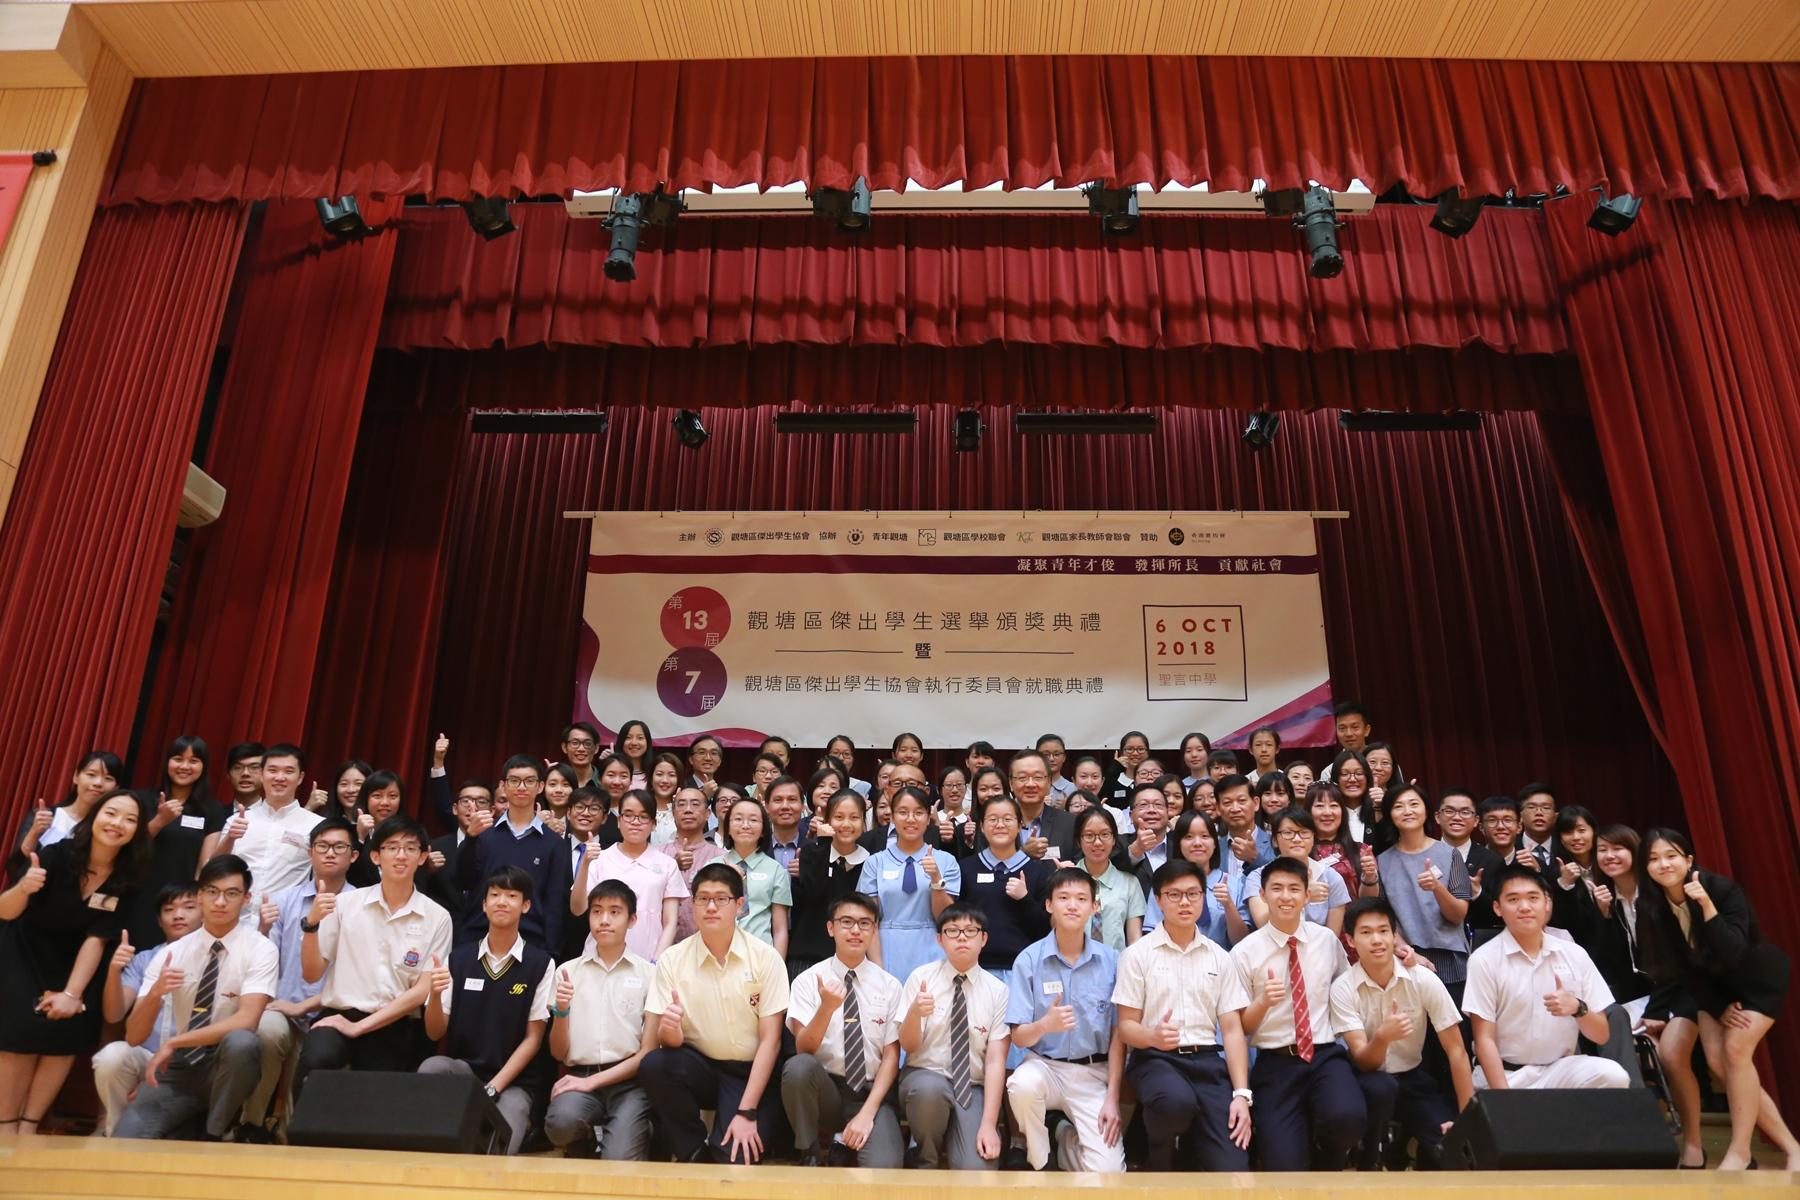 http://npc.edu.hk/sites/default/files/10800368064_img_0725.jpg